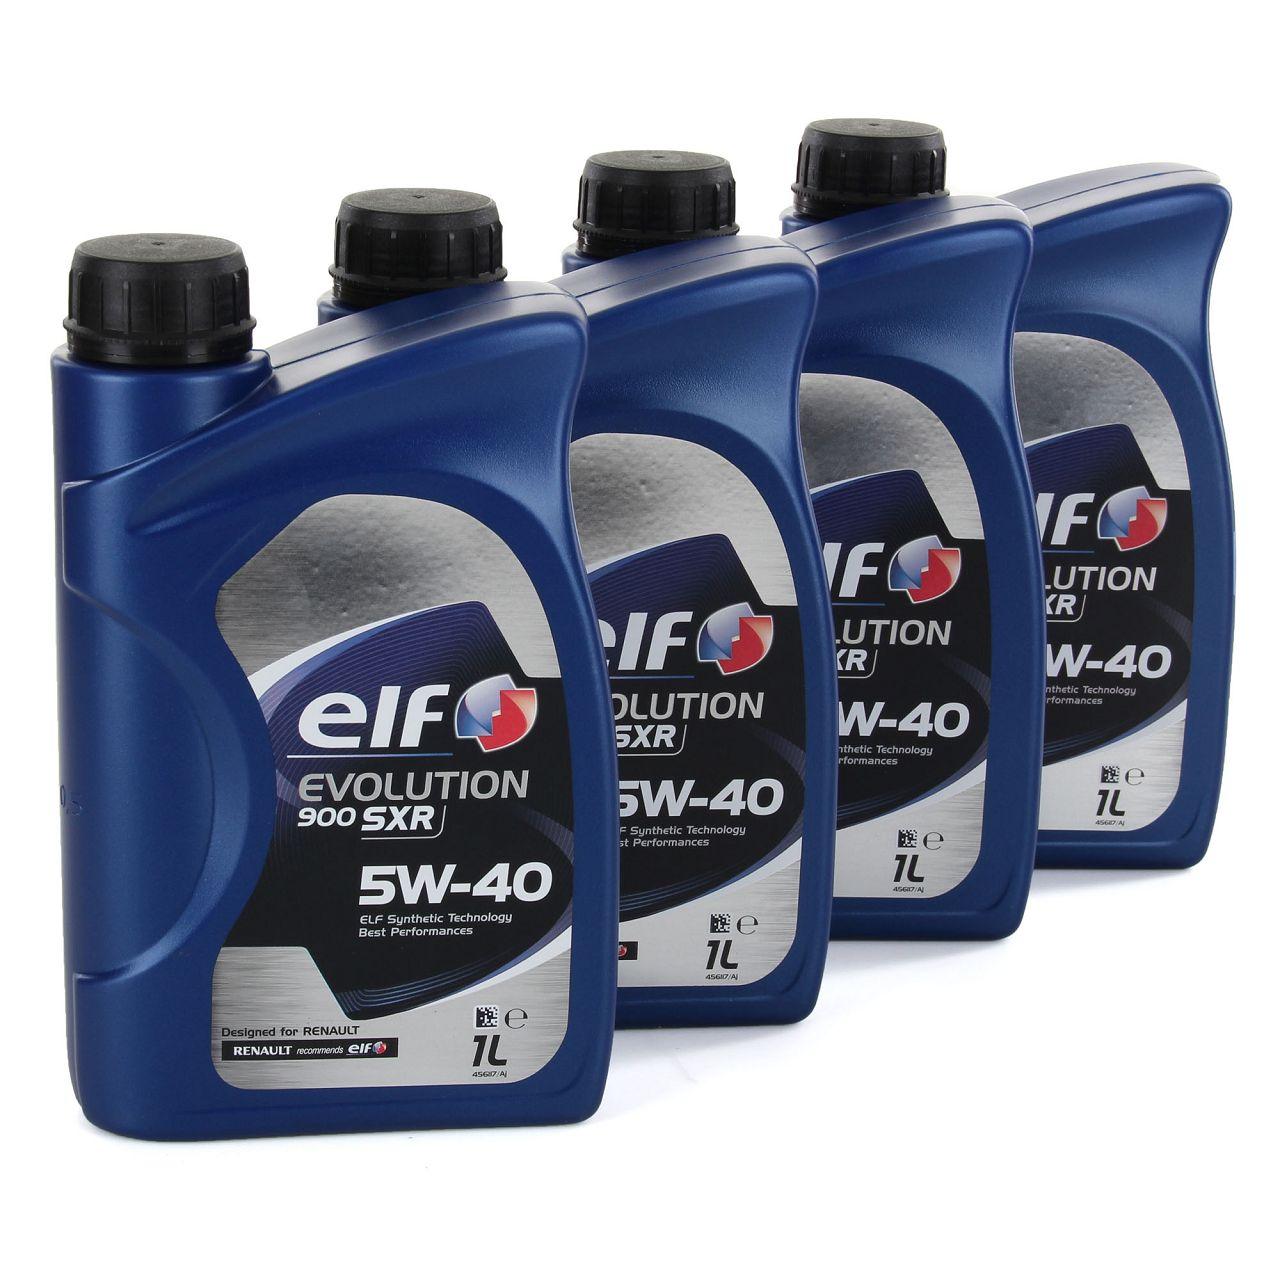 elf Evolution 900 SXR 5W-40 Motoröl RN0700 RN0710 MERCEDES 226.5 - 4L 4 Liter